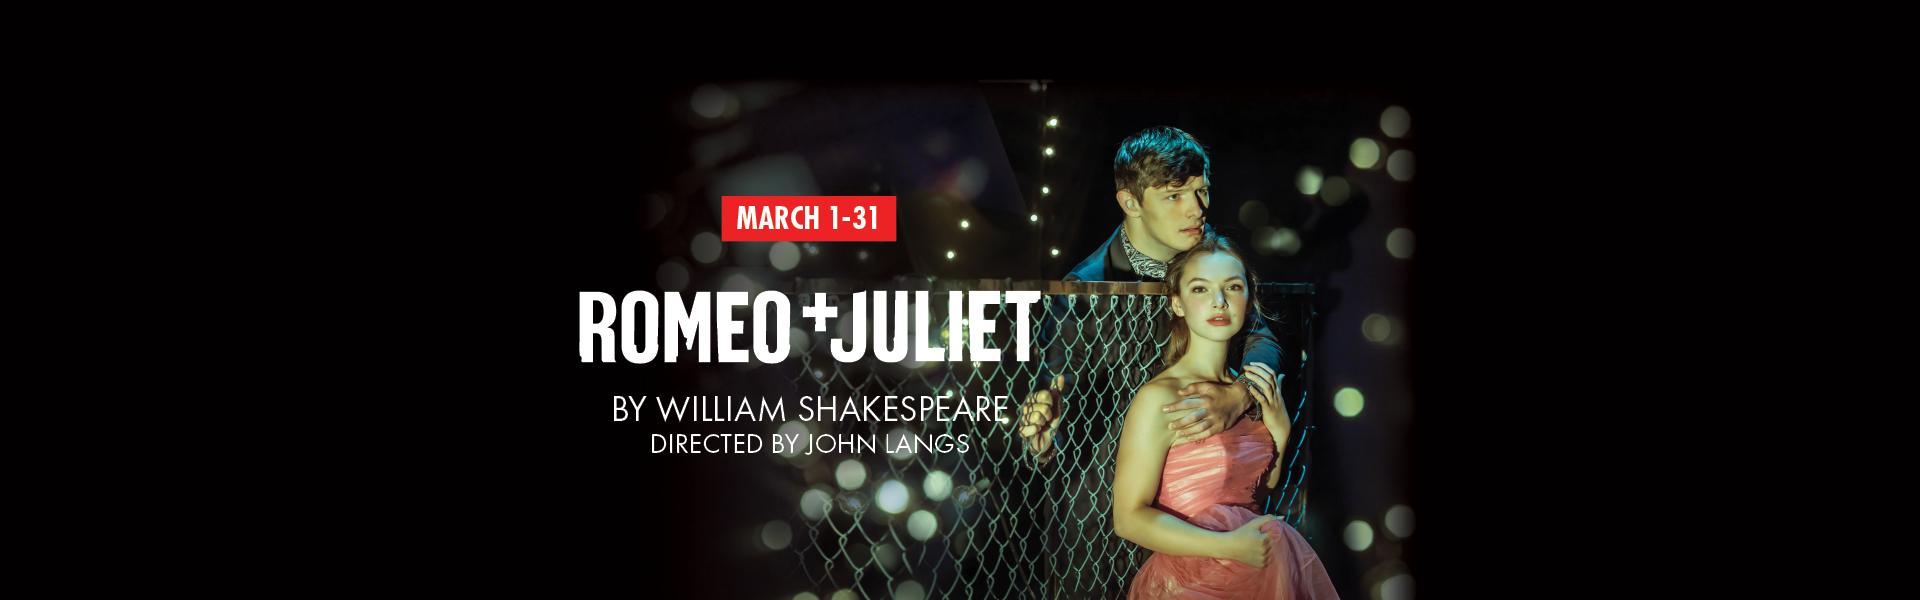 2019 Romeo & Juliet Page Banner